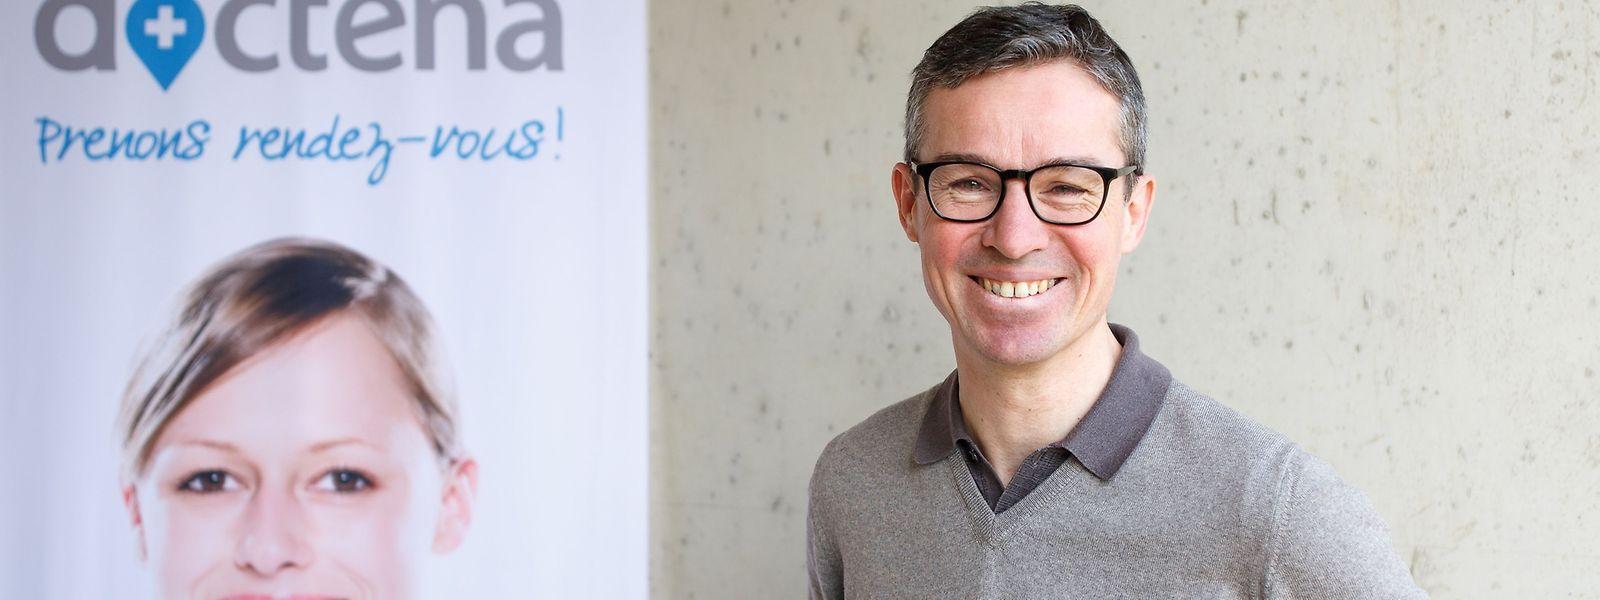 Patrick Kersten, Gründer der Plattform Doctena.